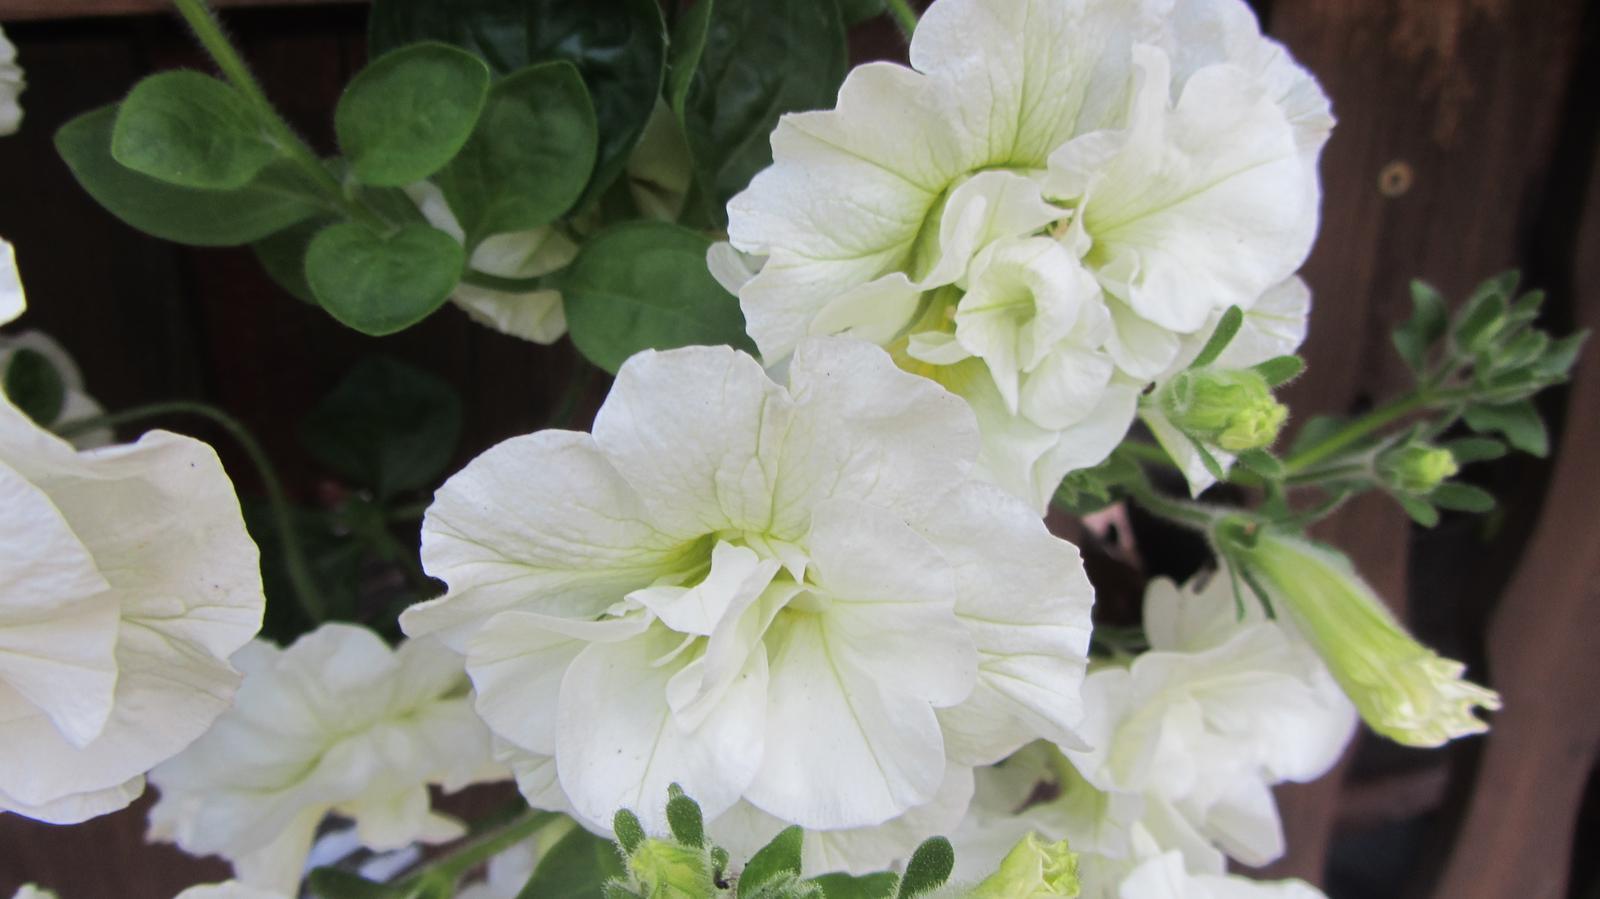 Zahrada 2016 - Obrázek č. 97